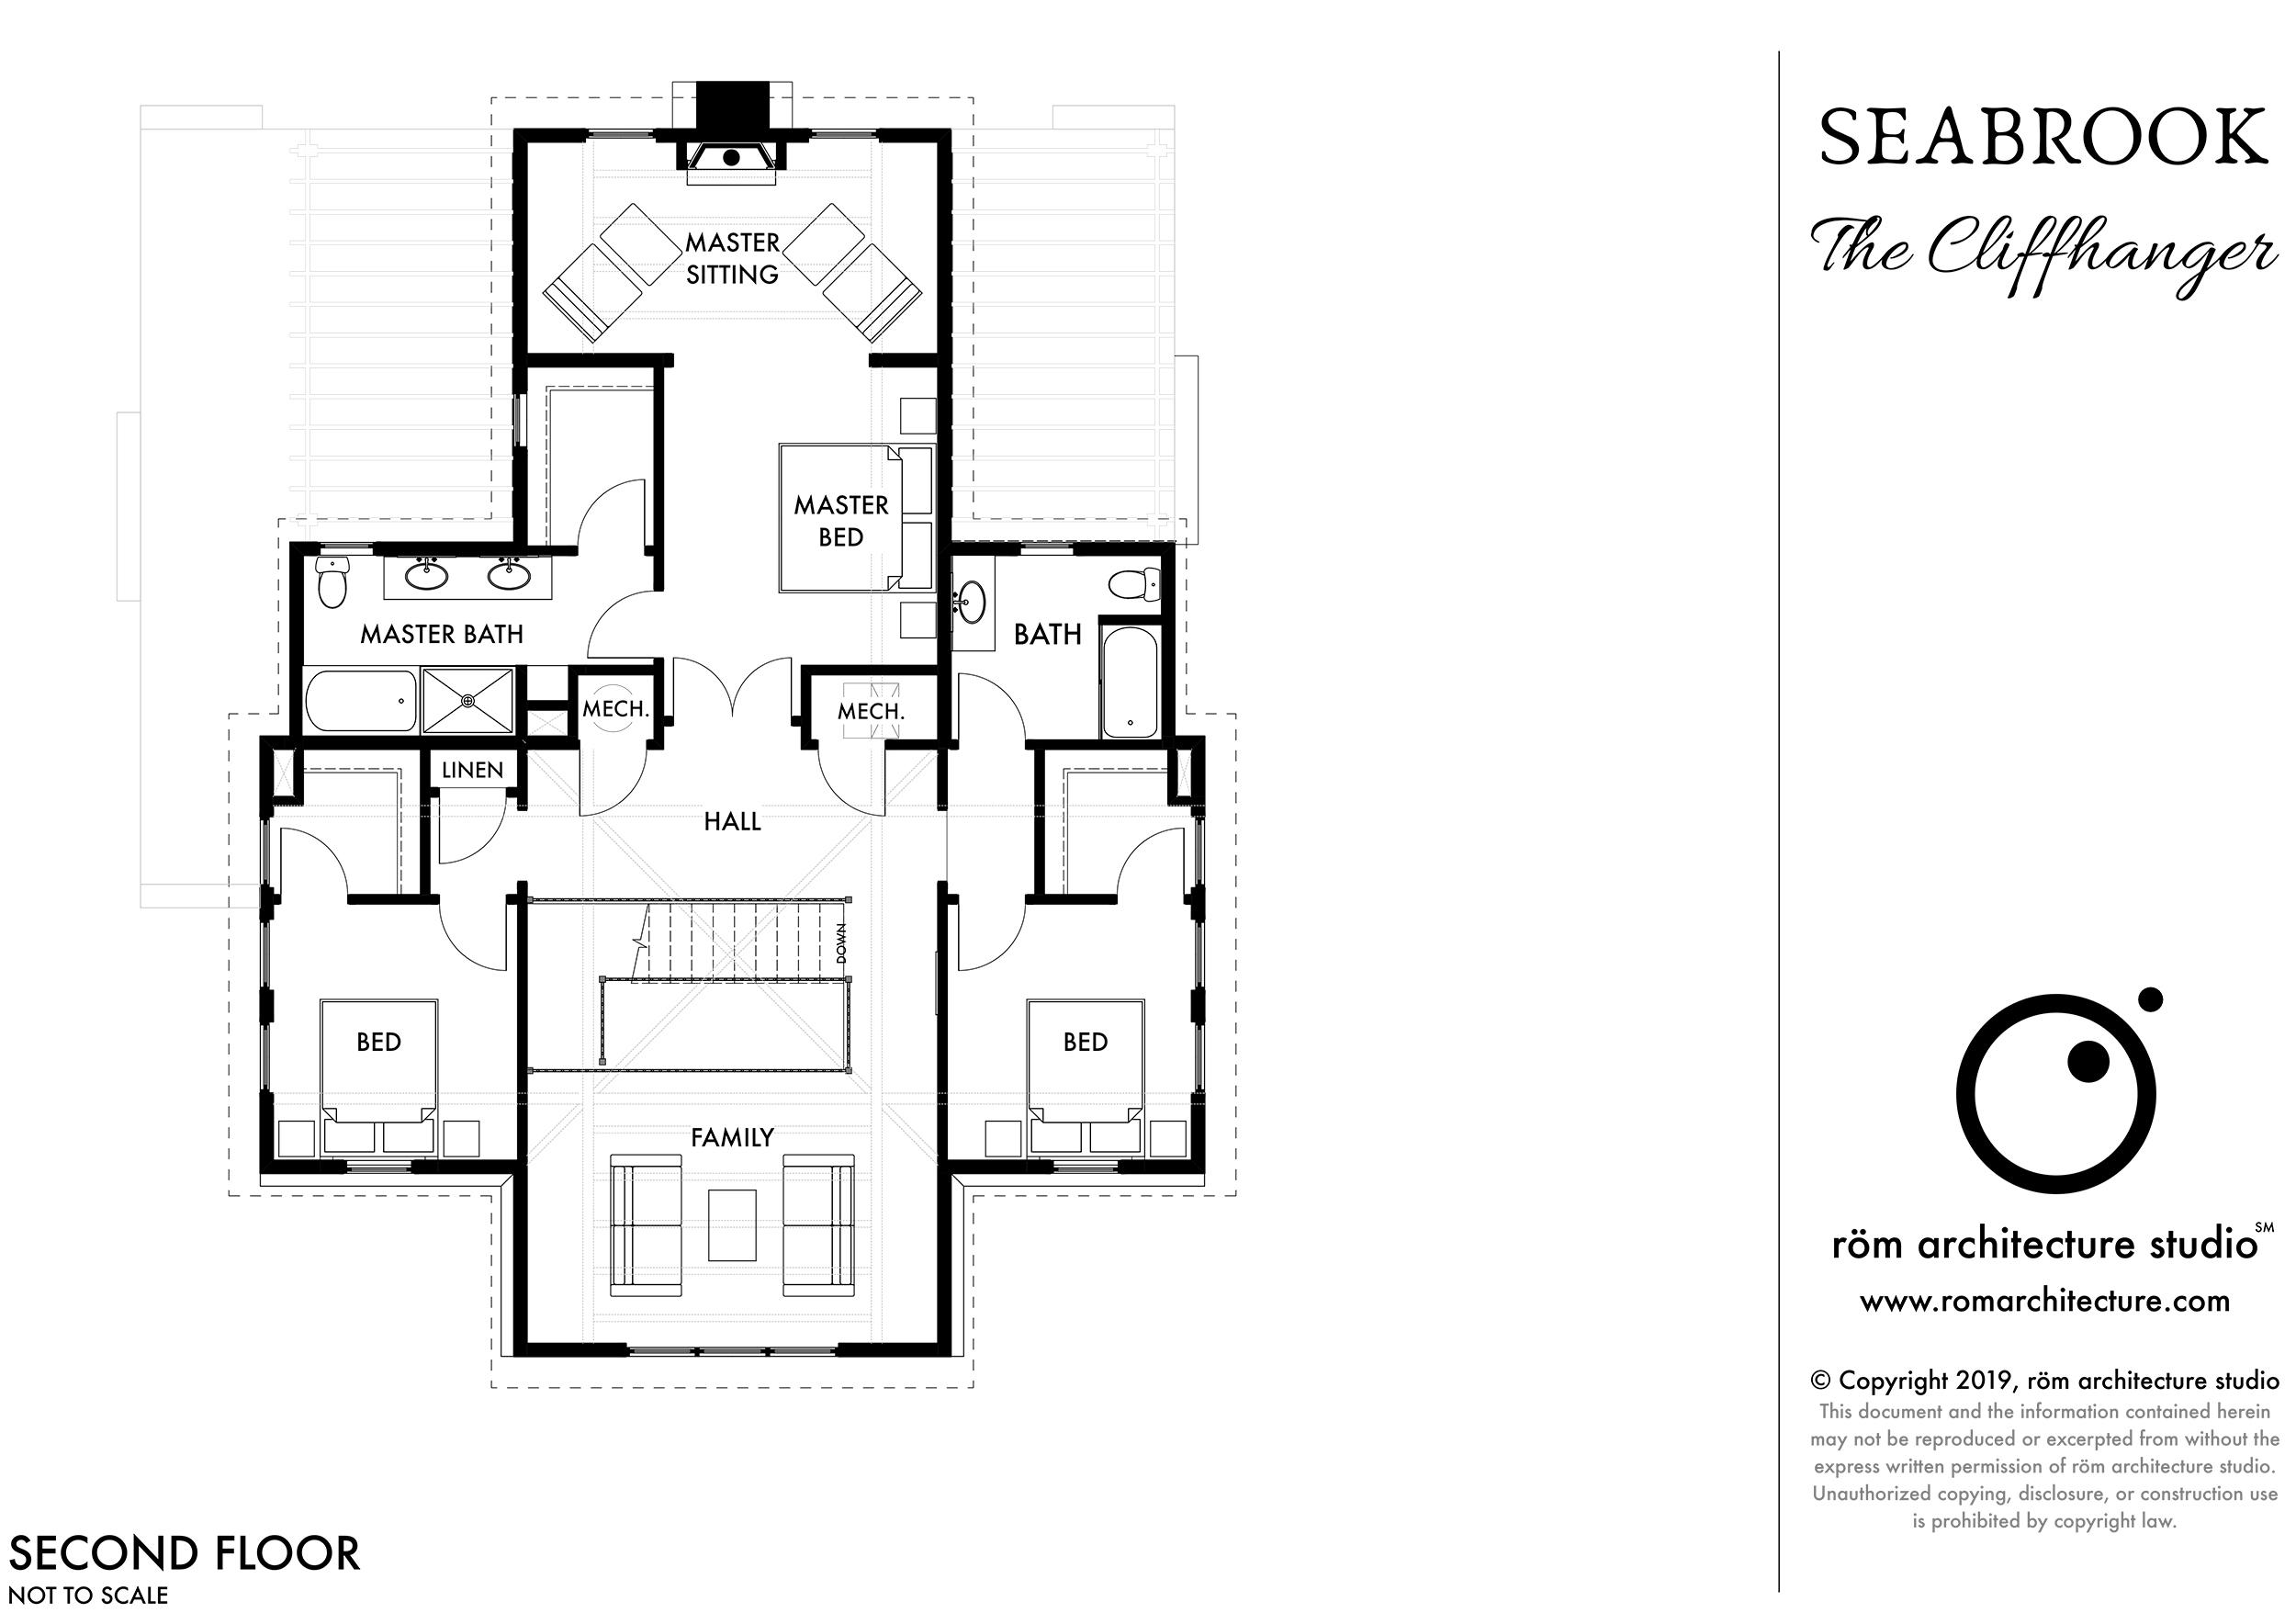 Seabrook-traditional-cottage-design-floor-plan-2.jpg